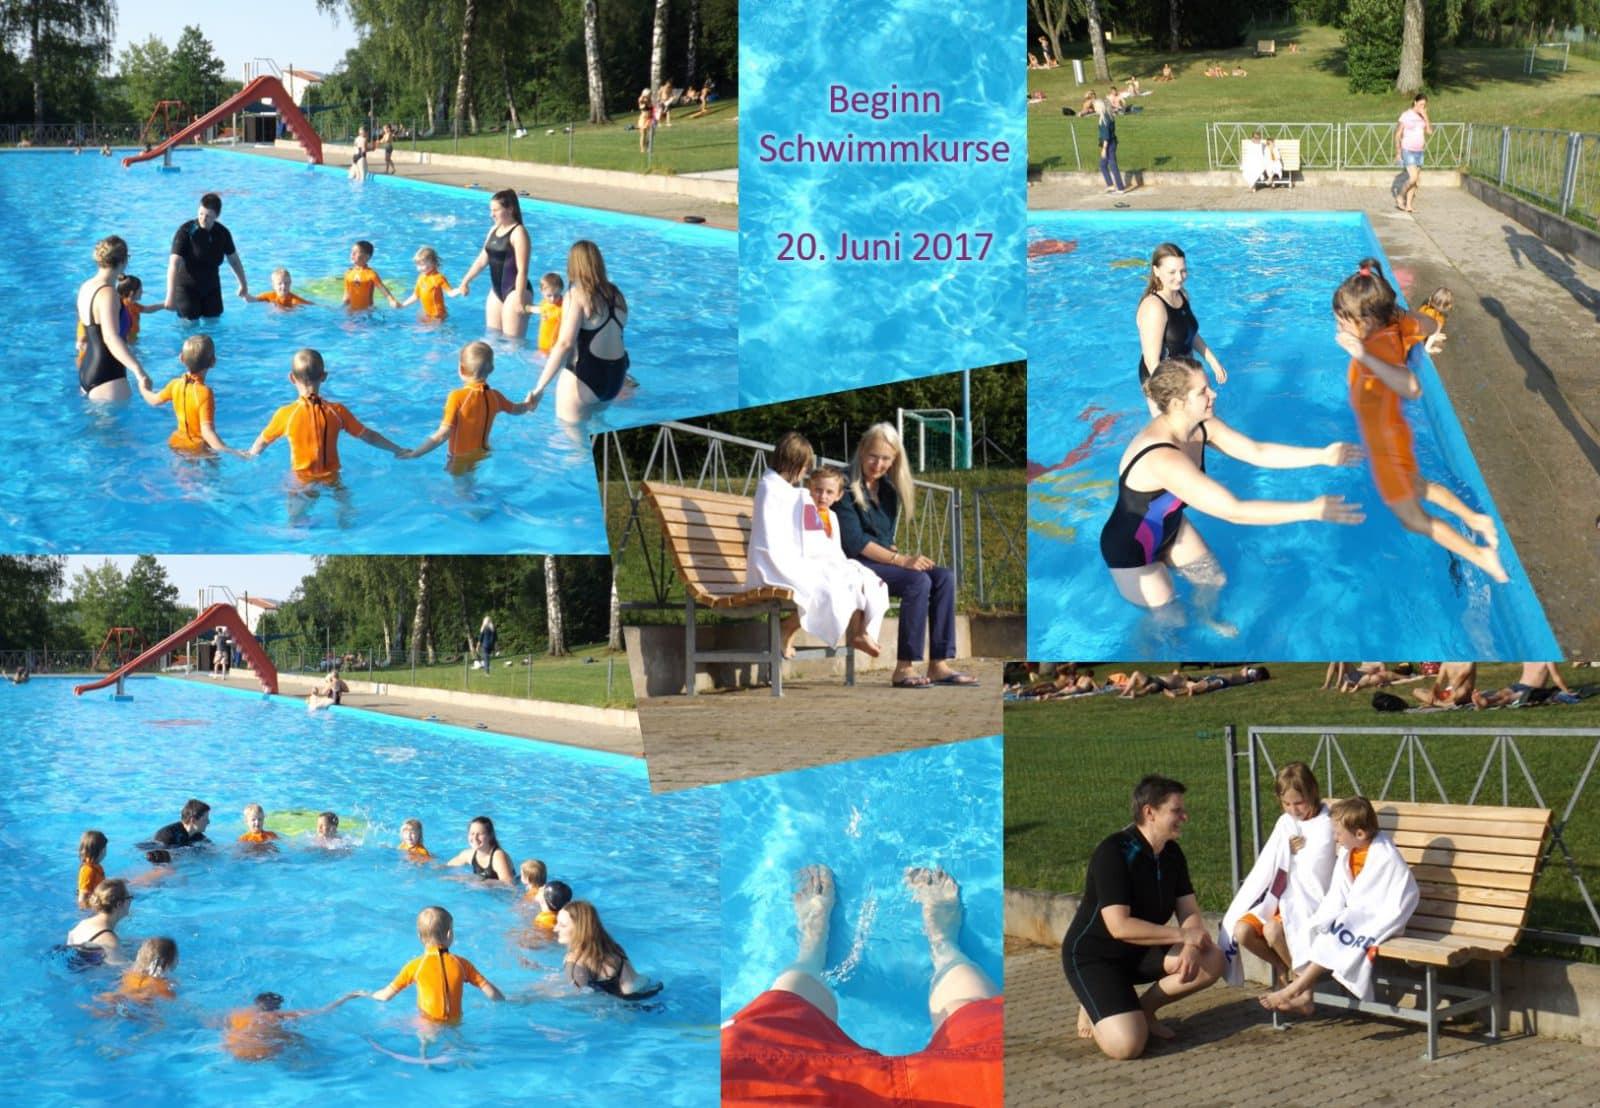 fotoseiteschwimmkursbeginn2017